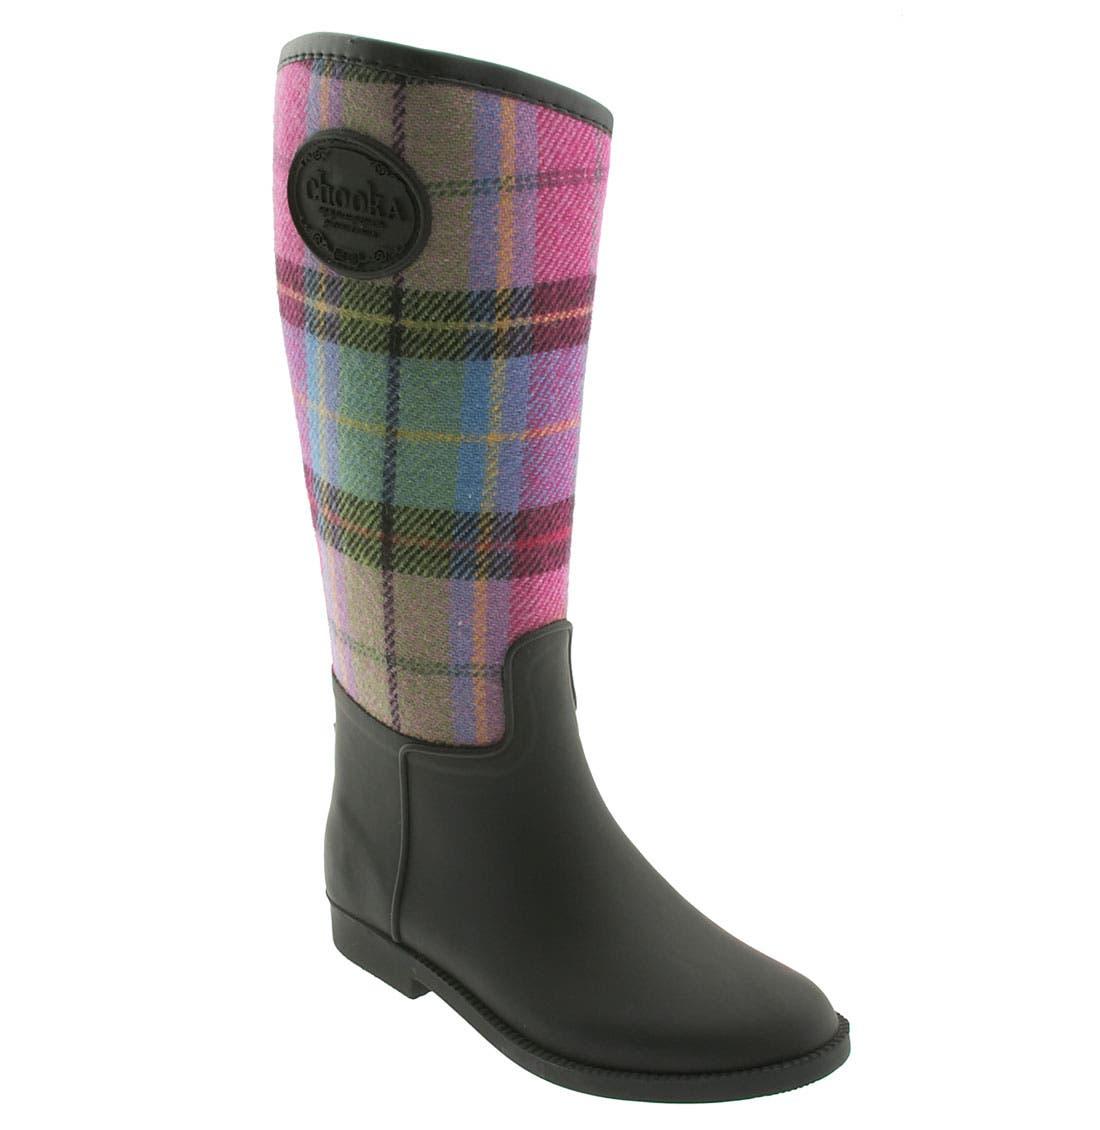 Alternate Image 1 Selected - Chooka Signature Plaid Rain Boot (Women)